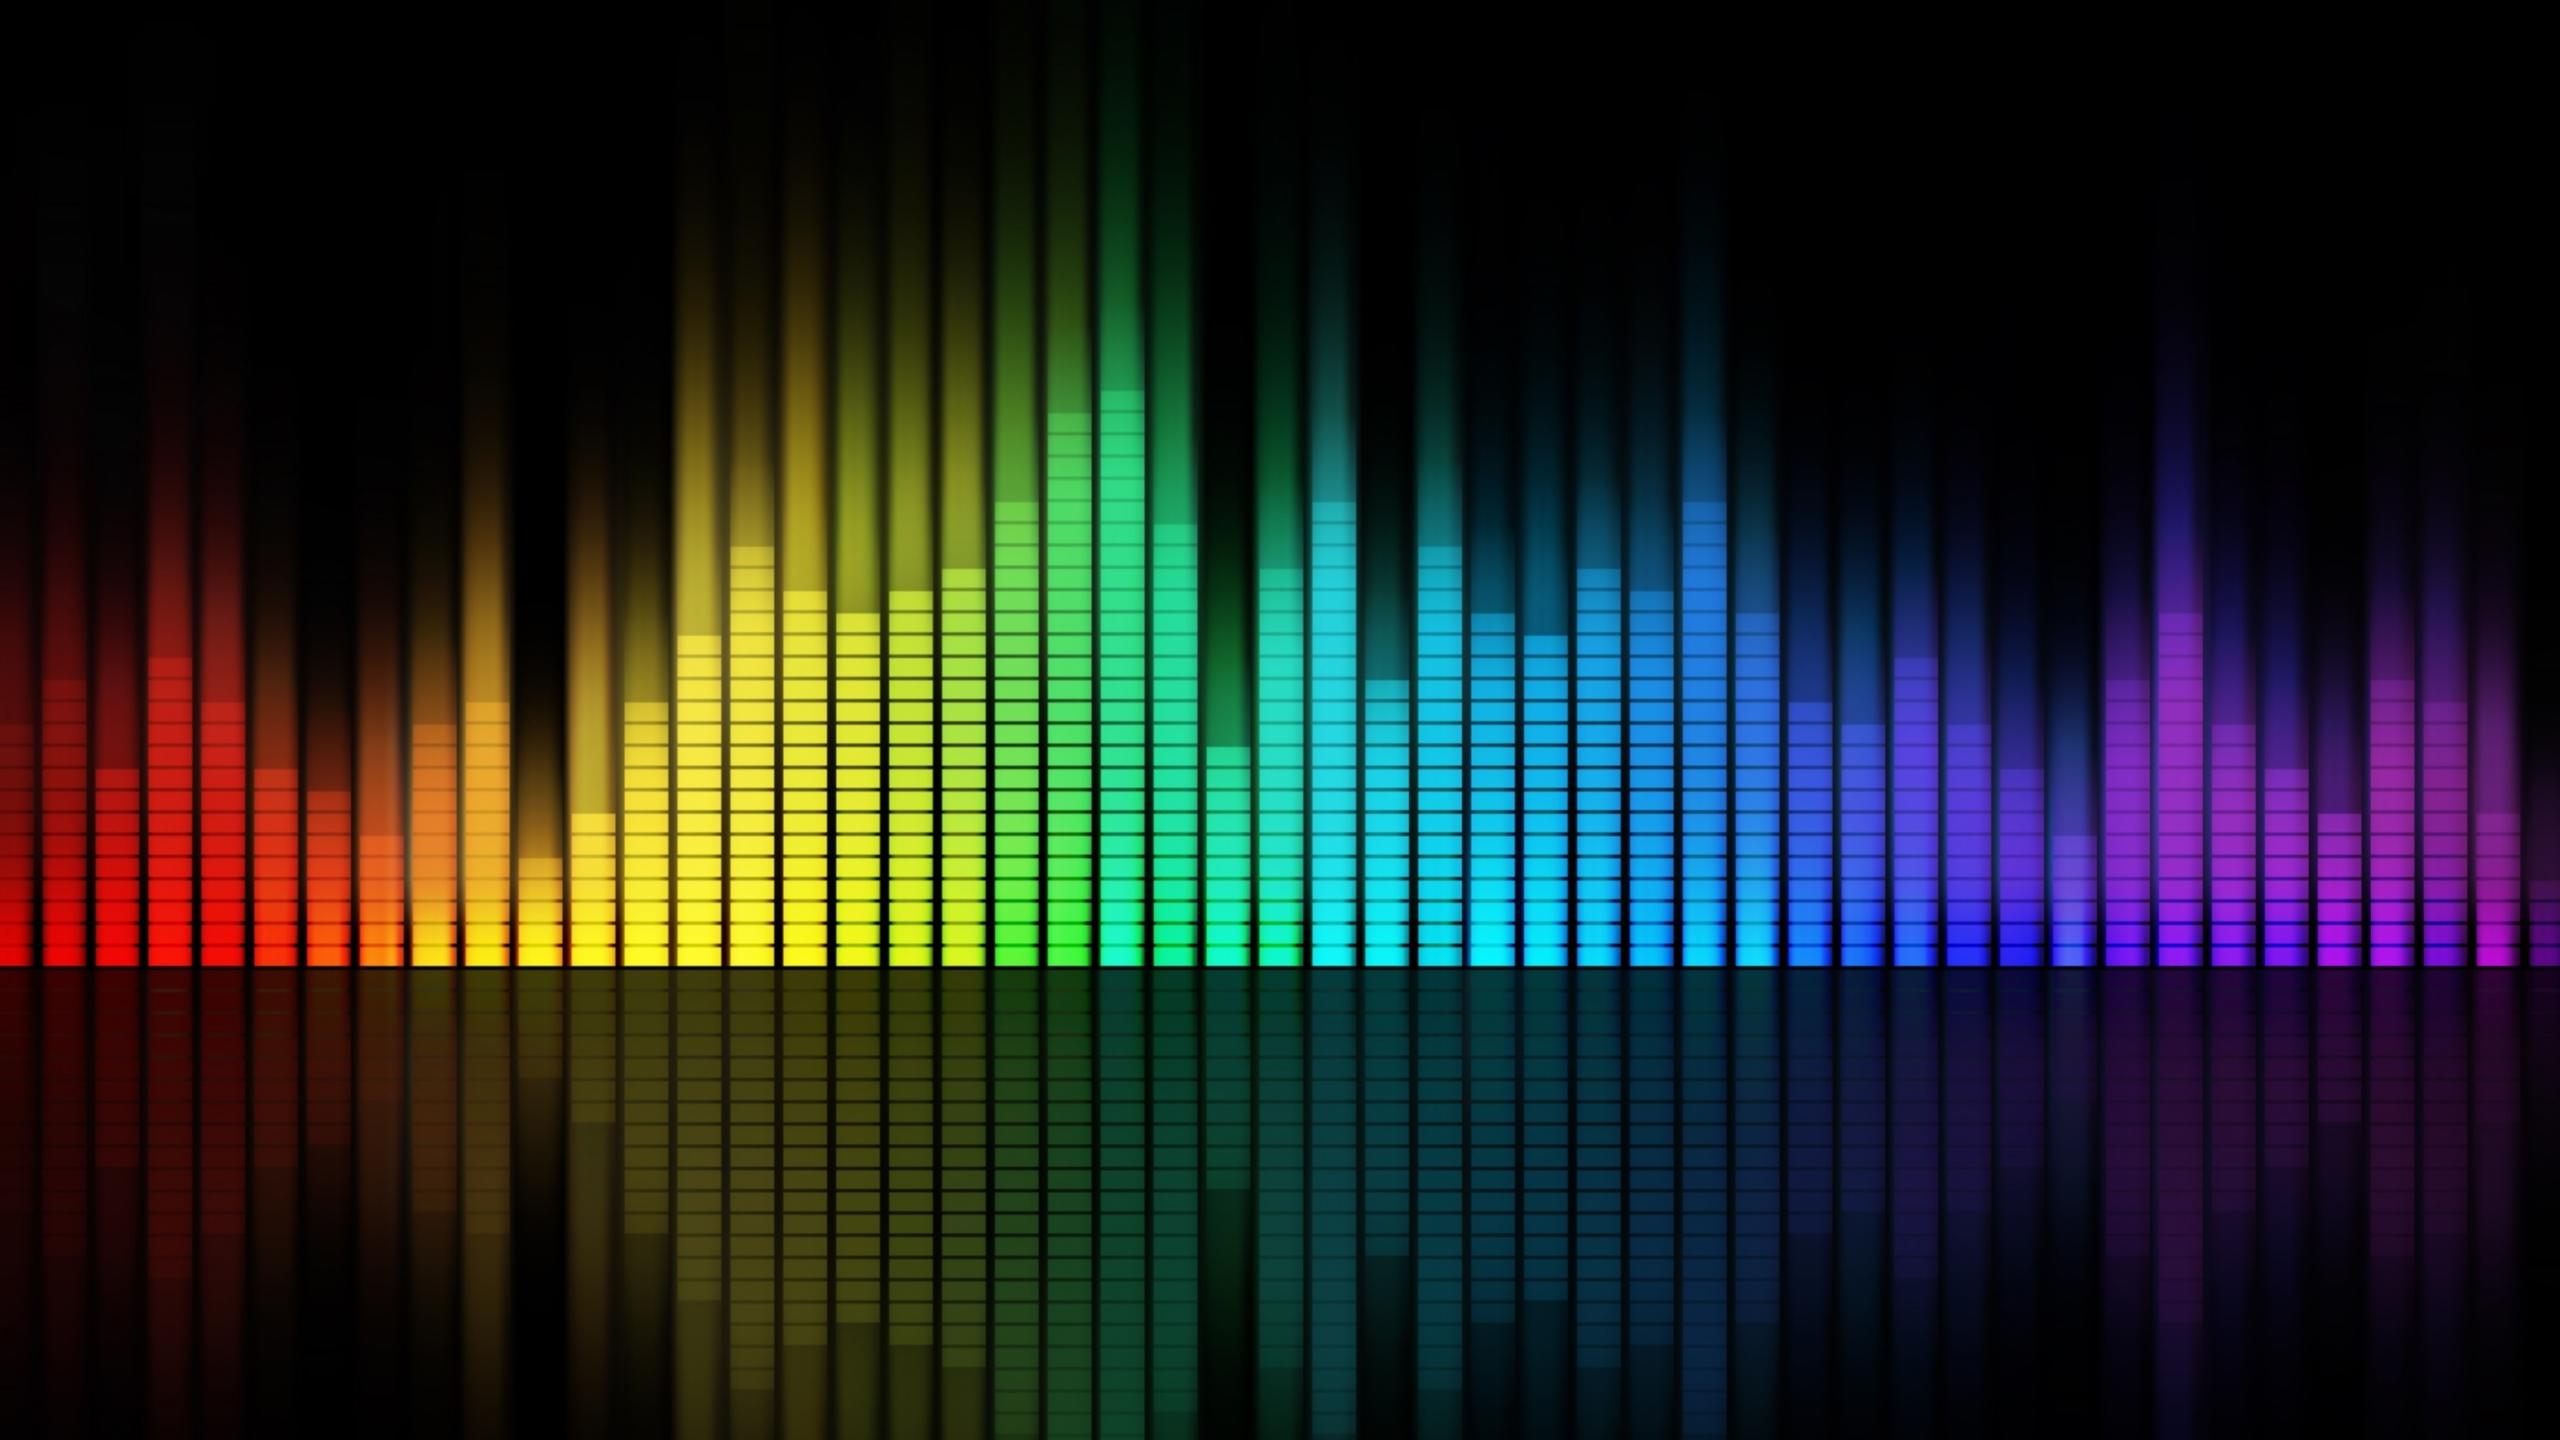 Music Equalizer Mac Wallpaper Download Mac Wallpapers Download 2560x1440